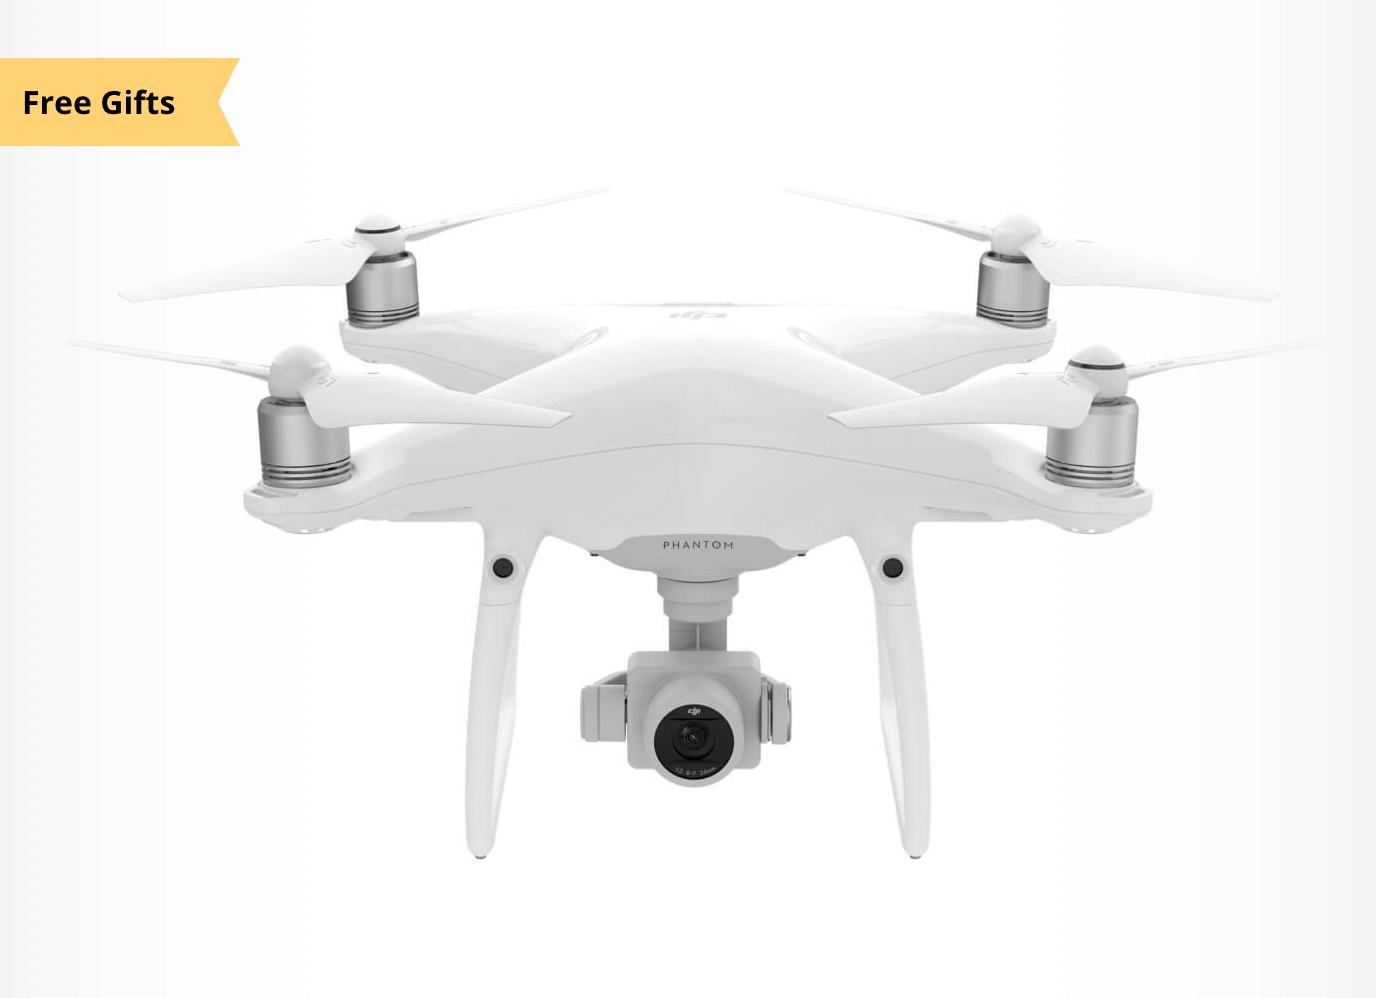 DJI Phantom Advanced Black Friday Drone Deal